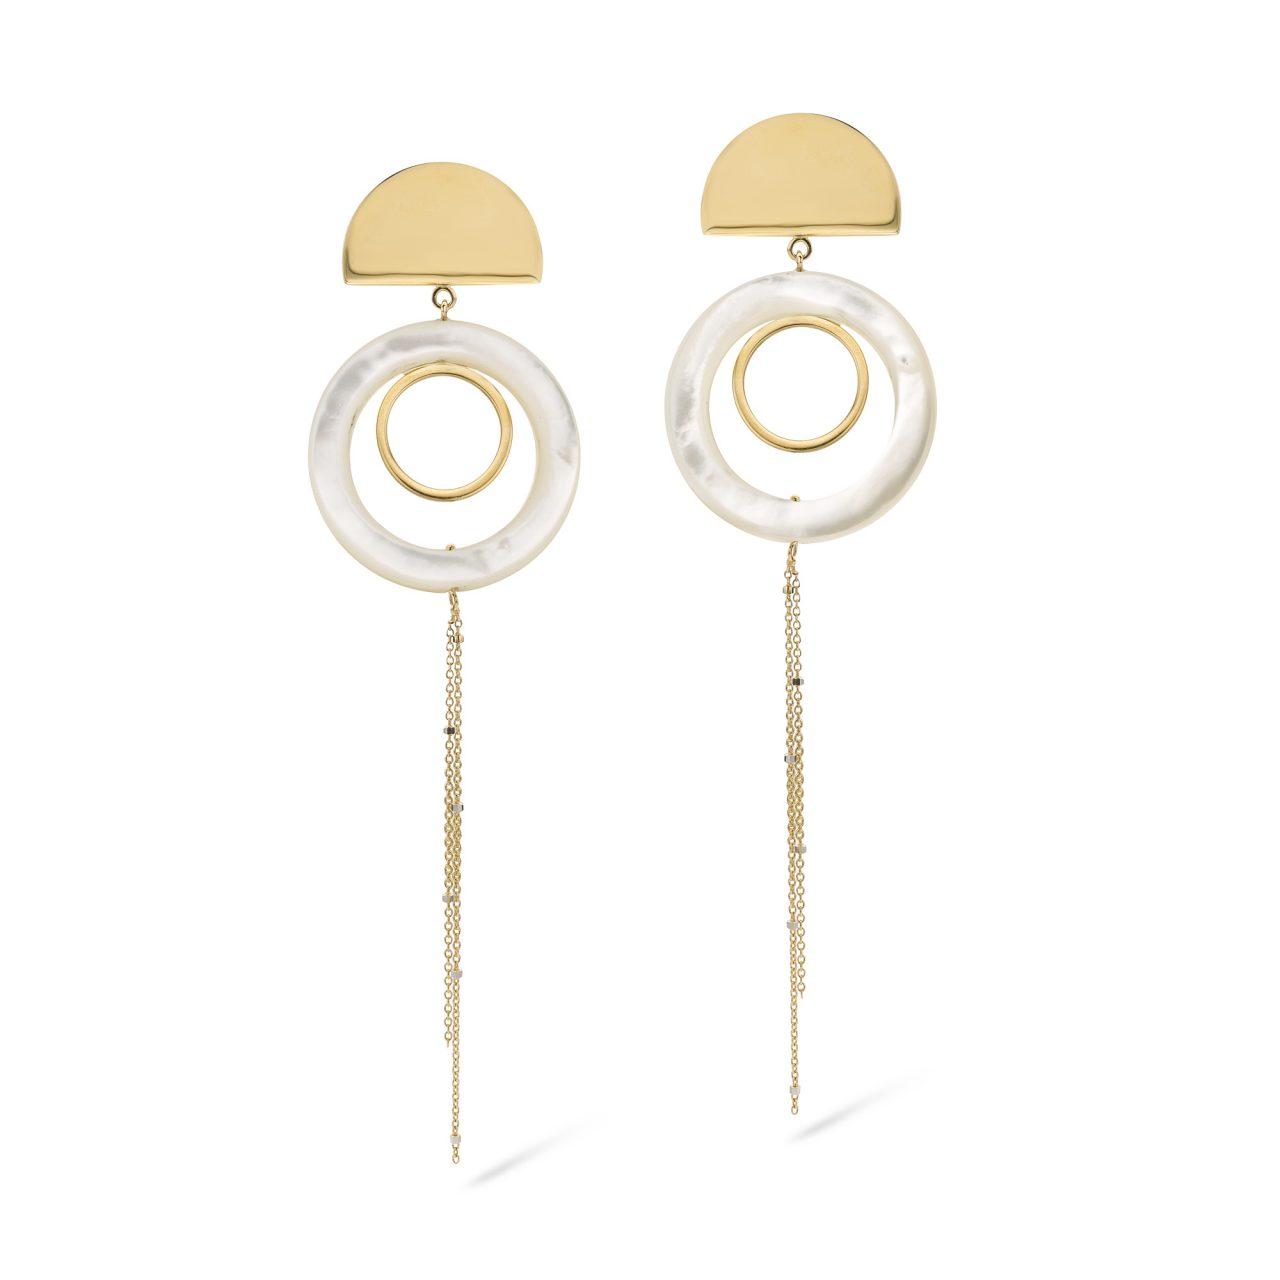 piece uniek parelmoer creolen statement earrings fine jewelry parel gent